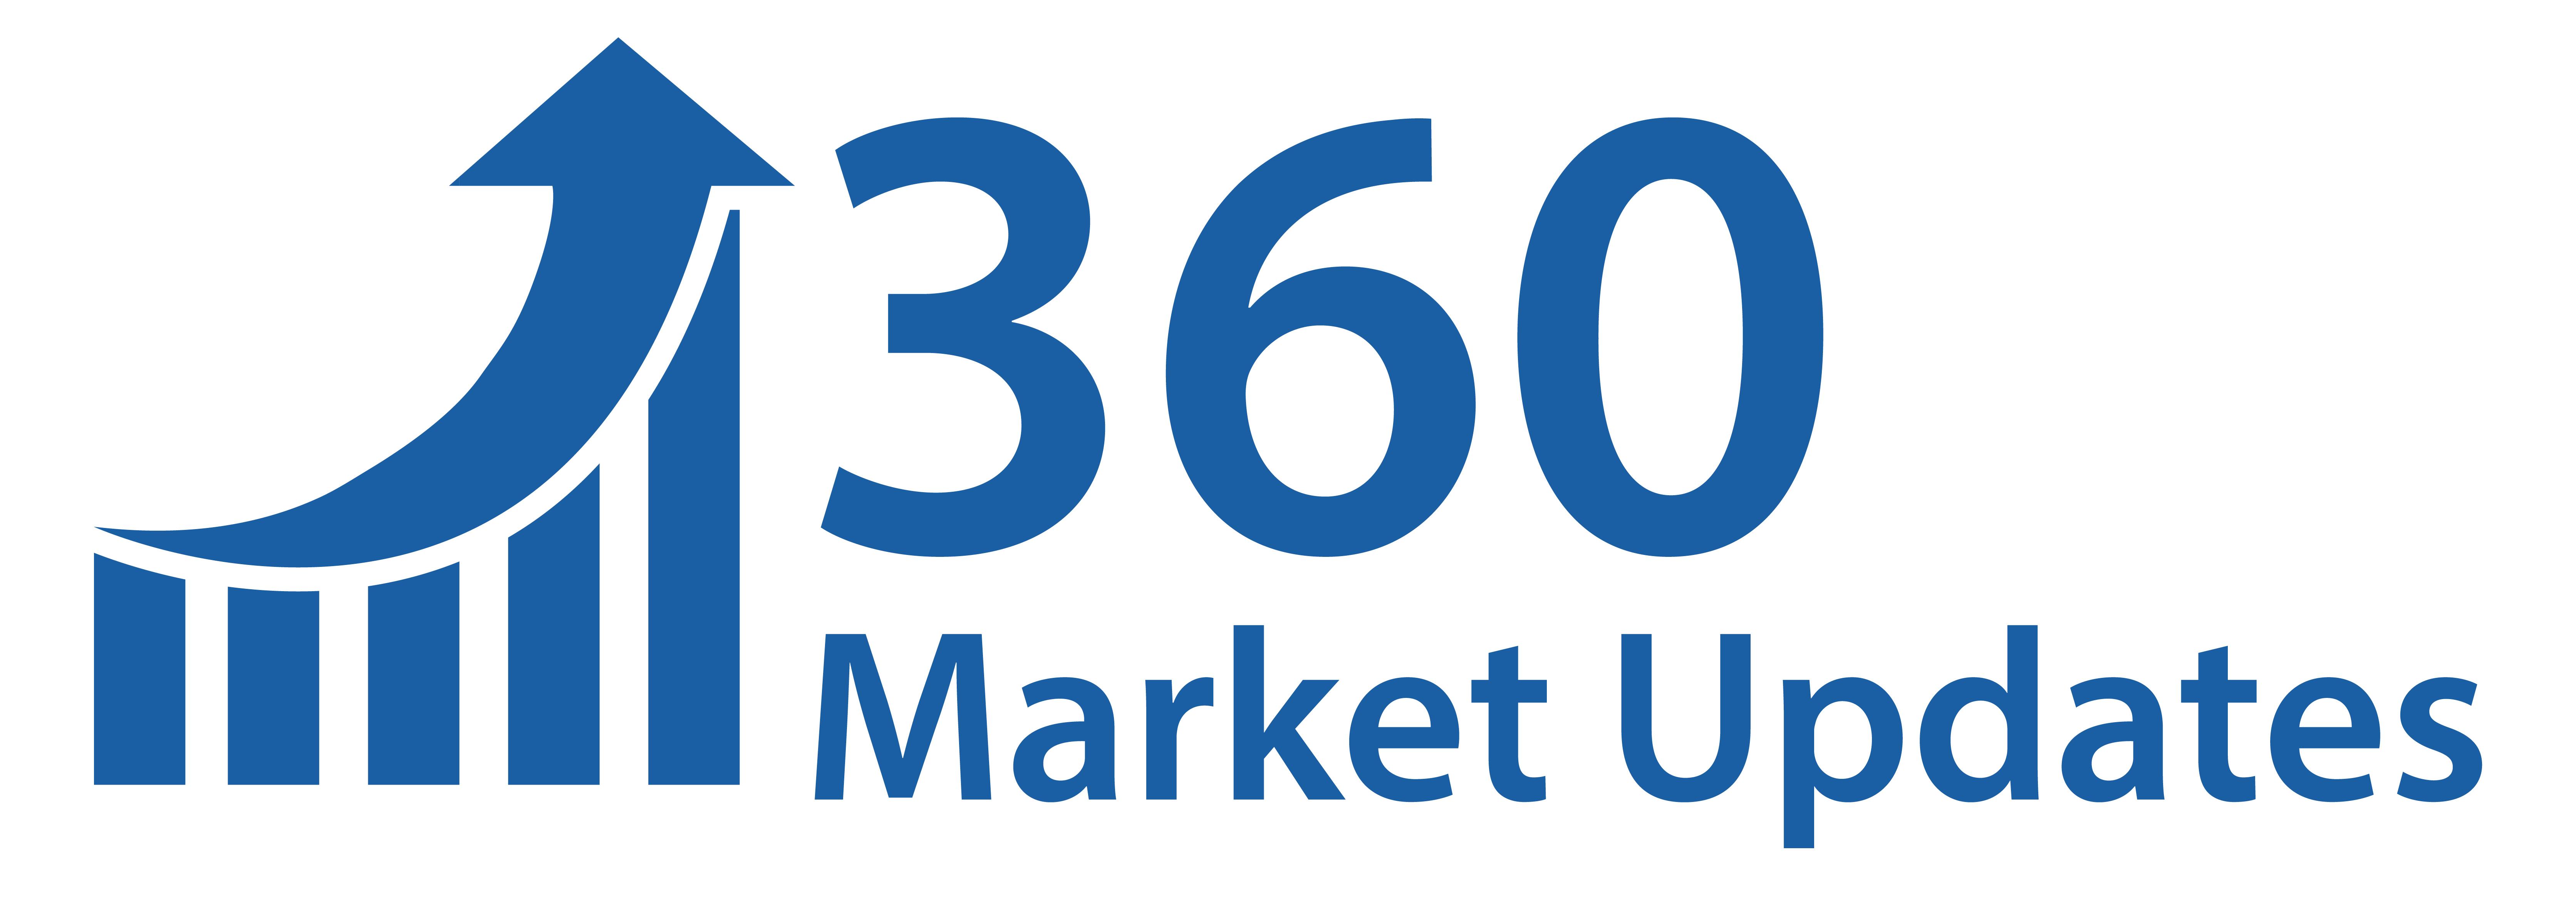 Probiotics Market Outlook 2020: Market Trends, Segmentation, consumption by Regional data, Market Growth and Competitive Landscape